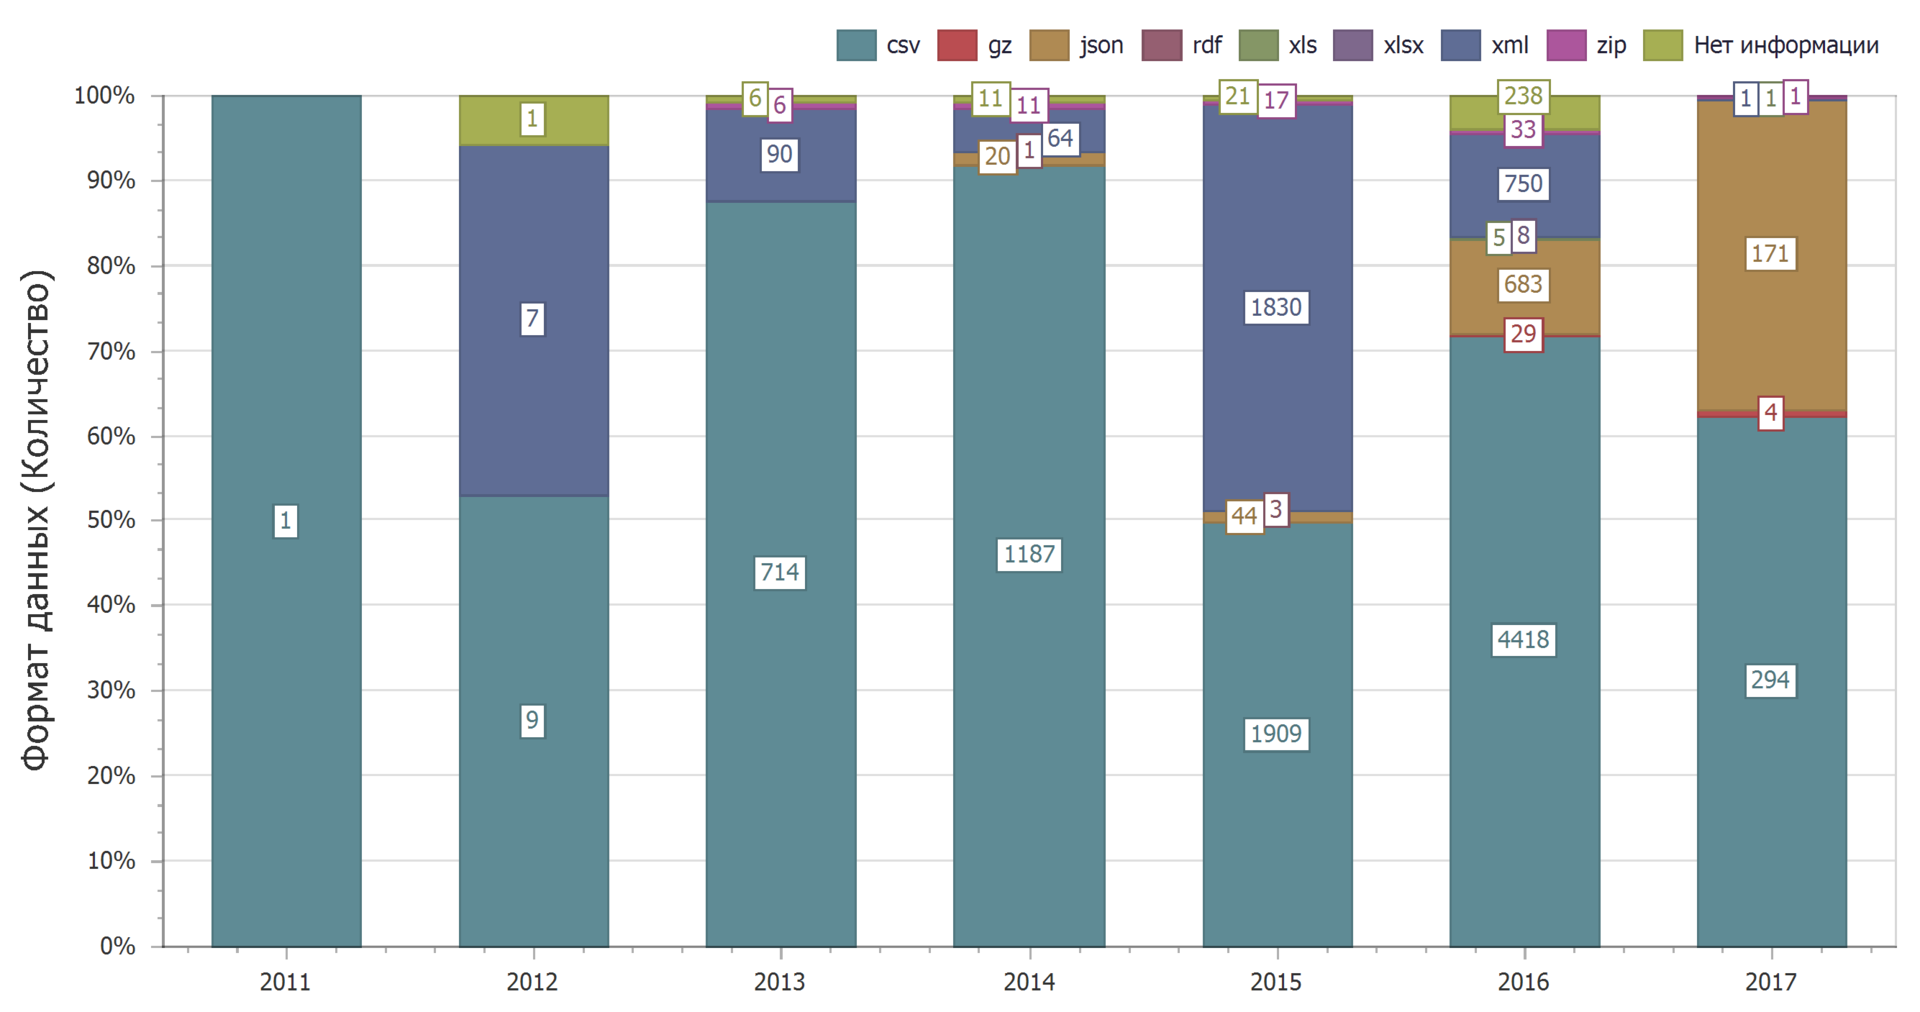 Анализ наборов данных с портала открытых данных data.gov.ru - 10